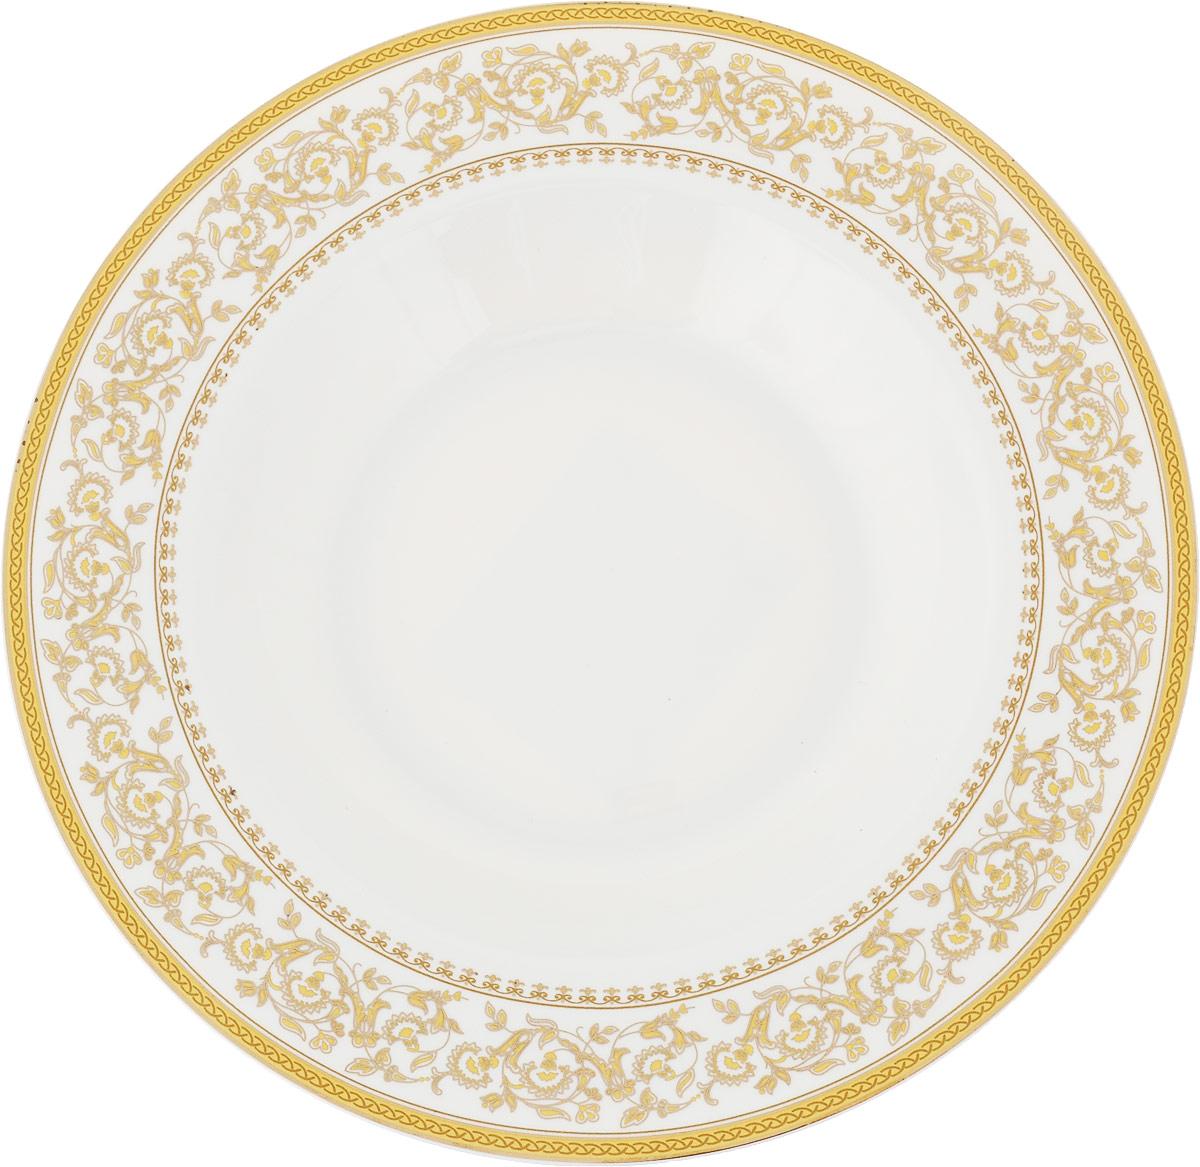 Тарелка суповая МФК-профит Империя, диаметр 21,5 см коврики в салон автомобиля norplast npl po 46 65